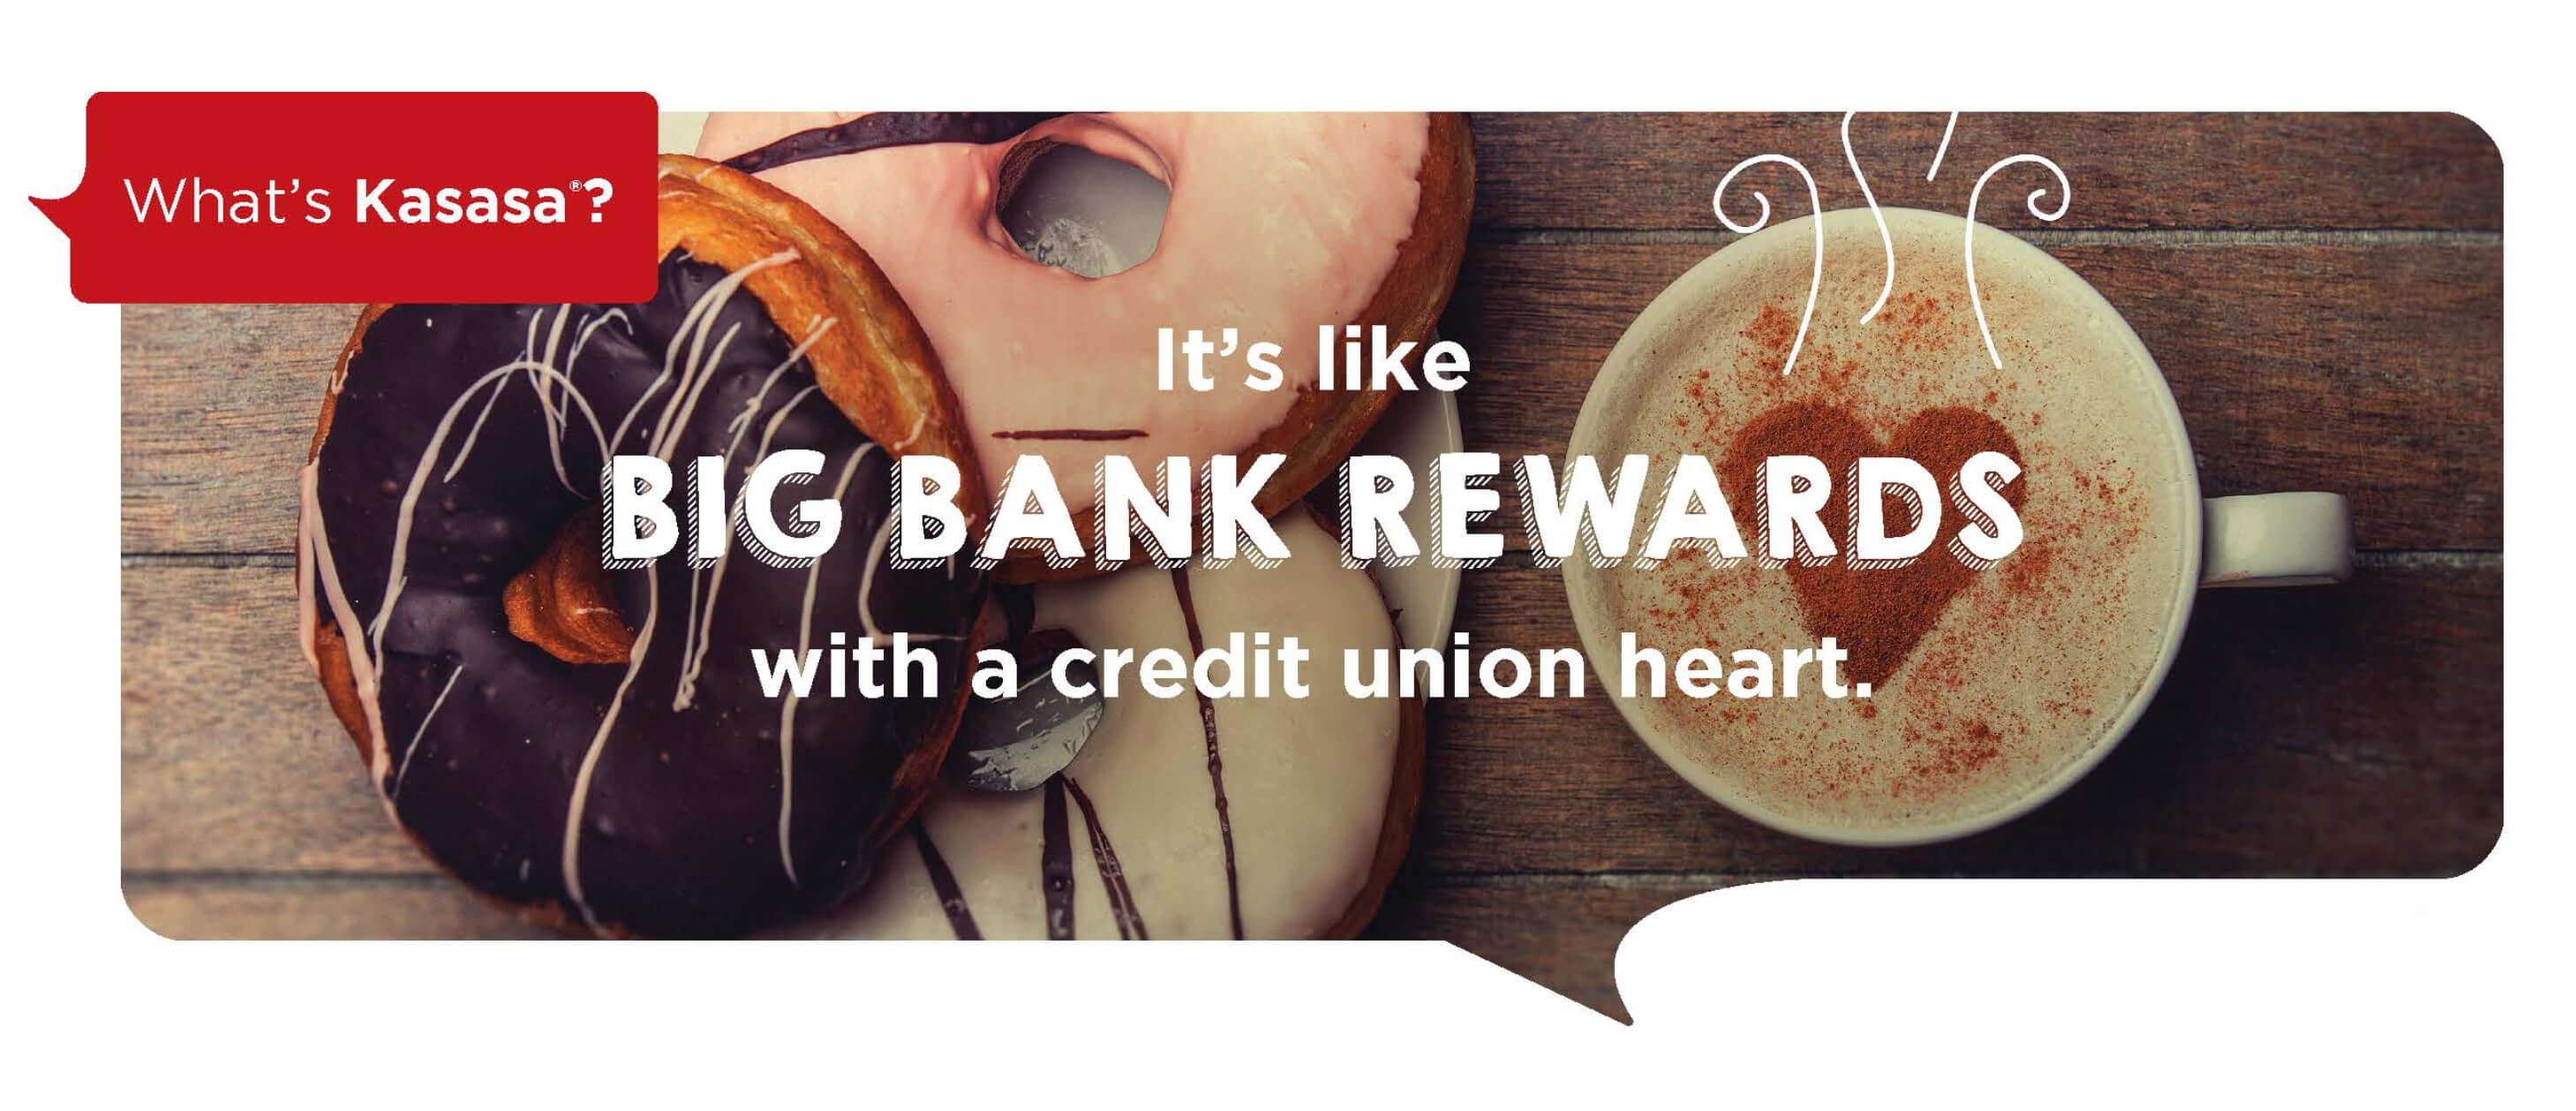 BIG BANK REWARDS   CREDIT UNION HEART